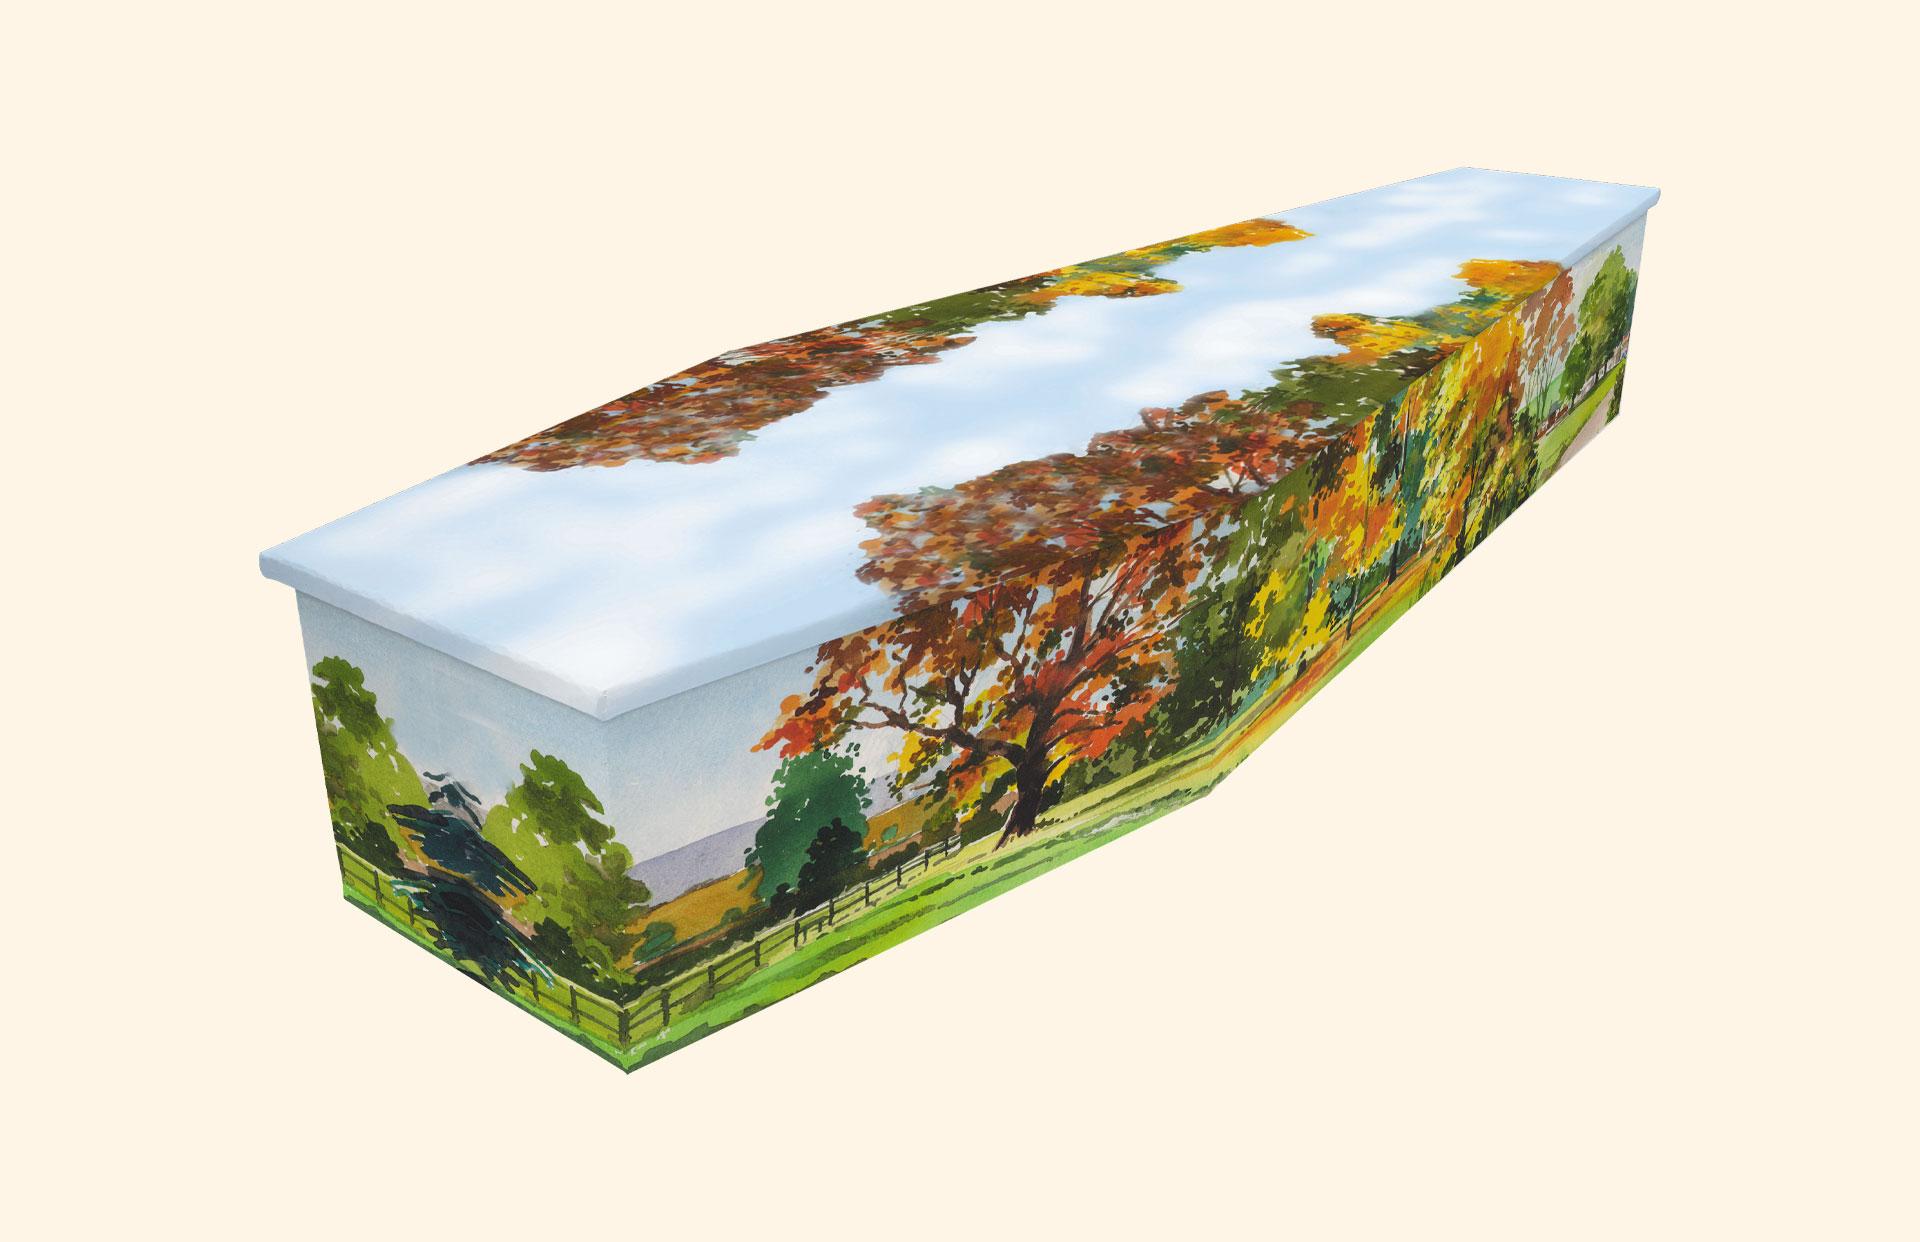 Autumn design on a cardboard coffin